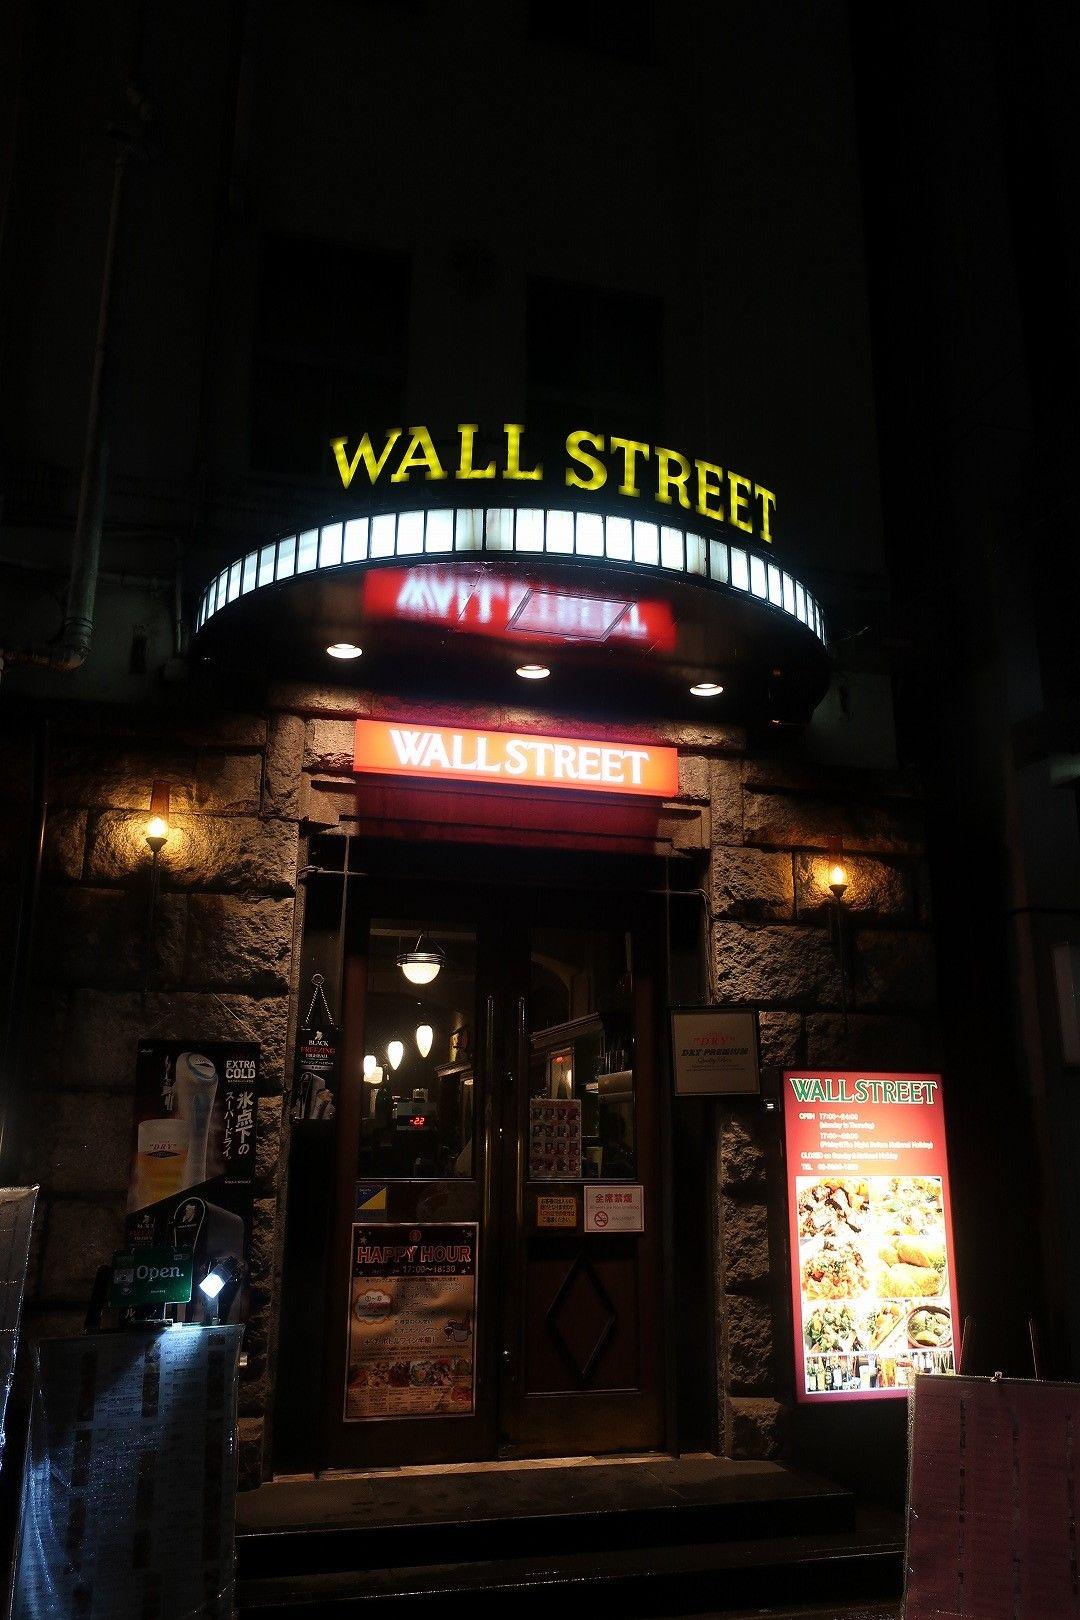 WALLSTREET (5)